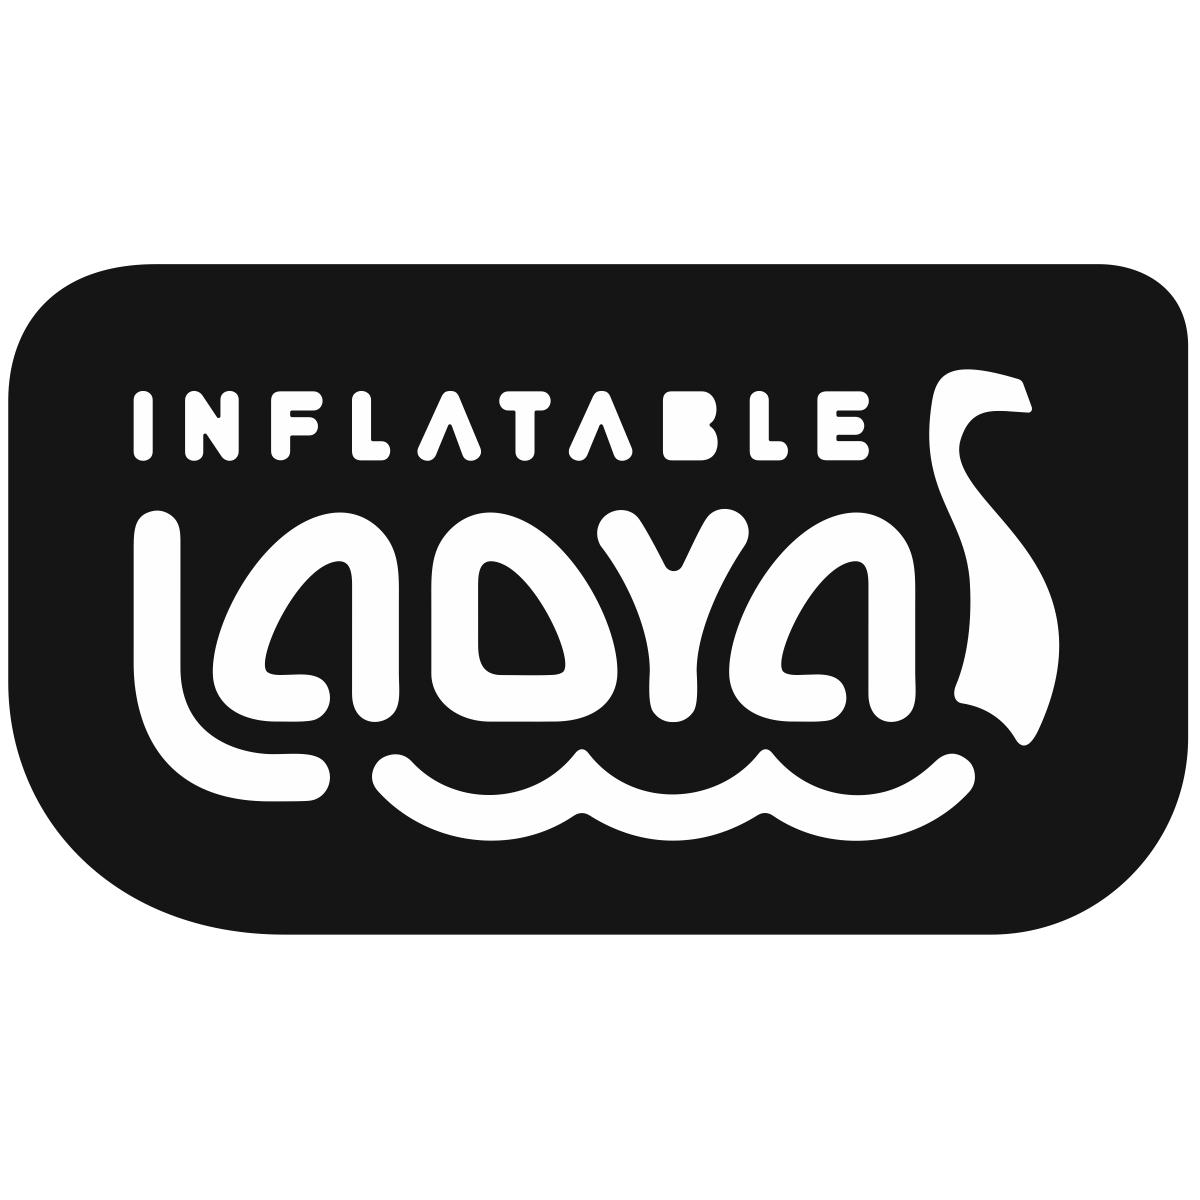 Ladya logo design by logo designer Kovalen.com